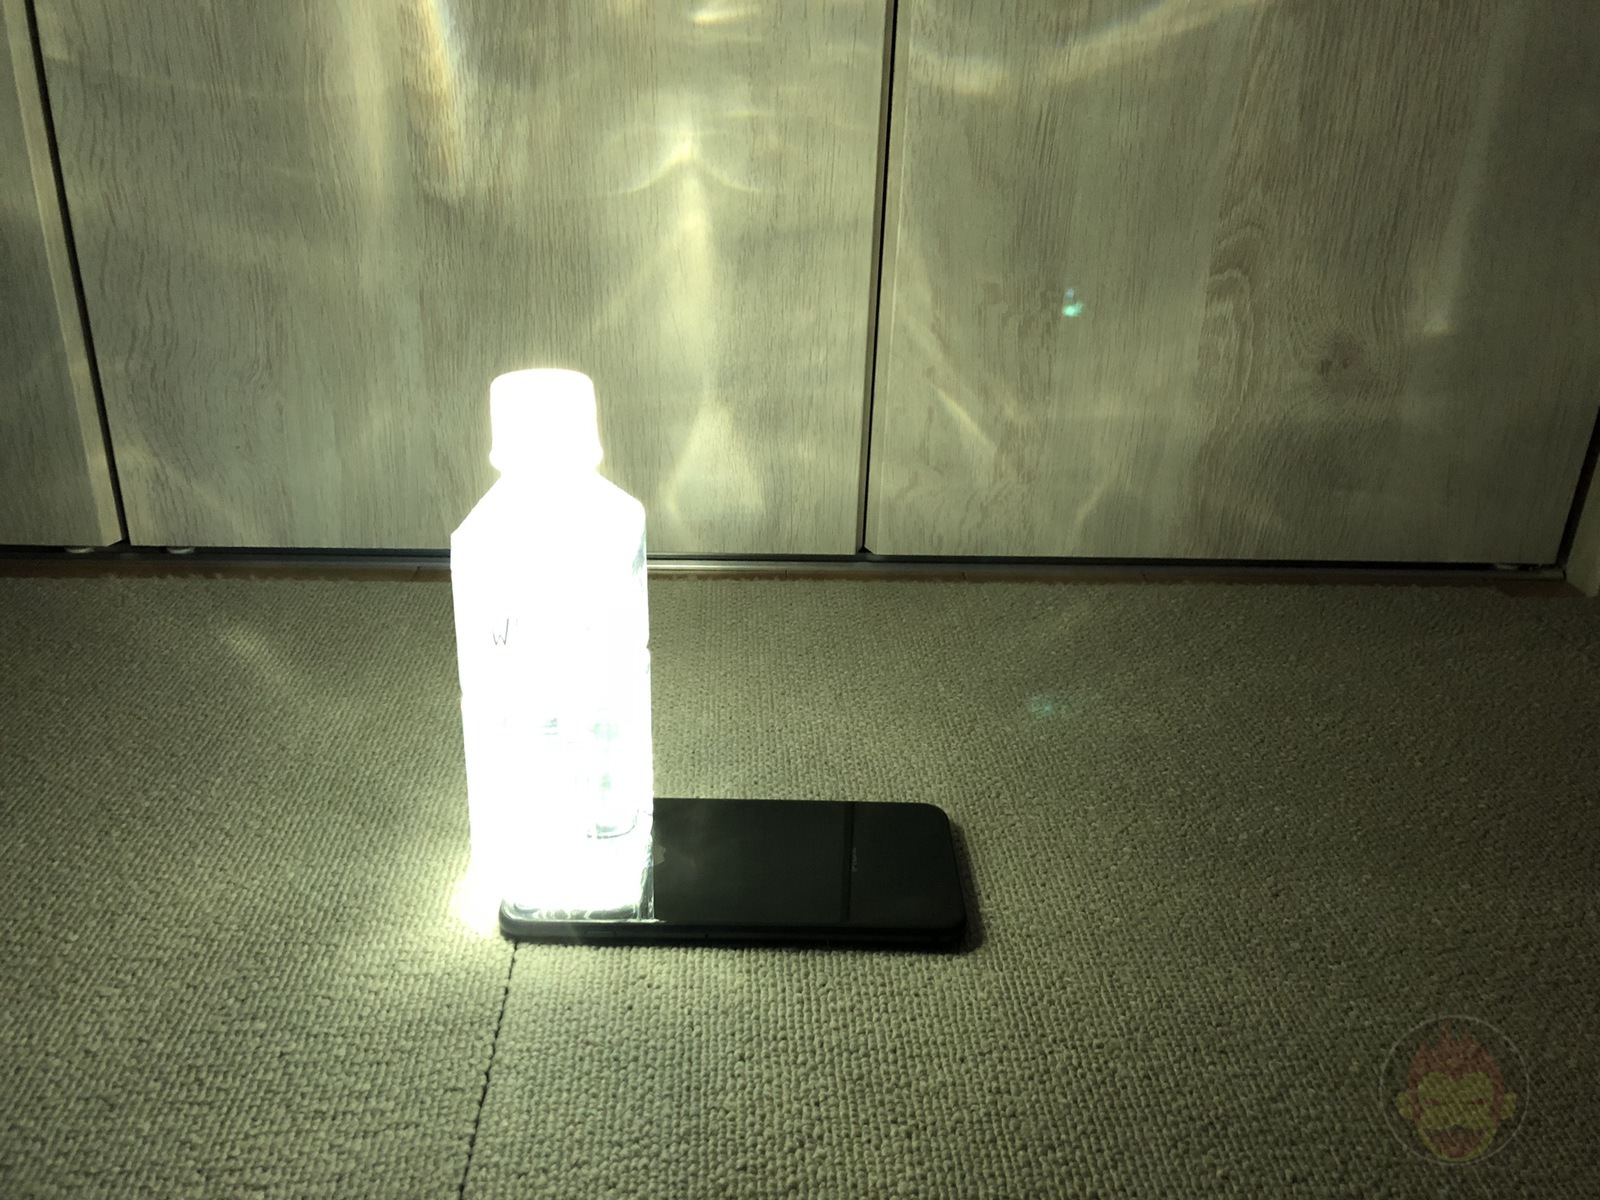 Using Smartphone as Light 01